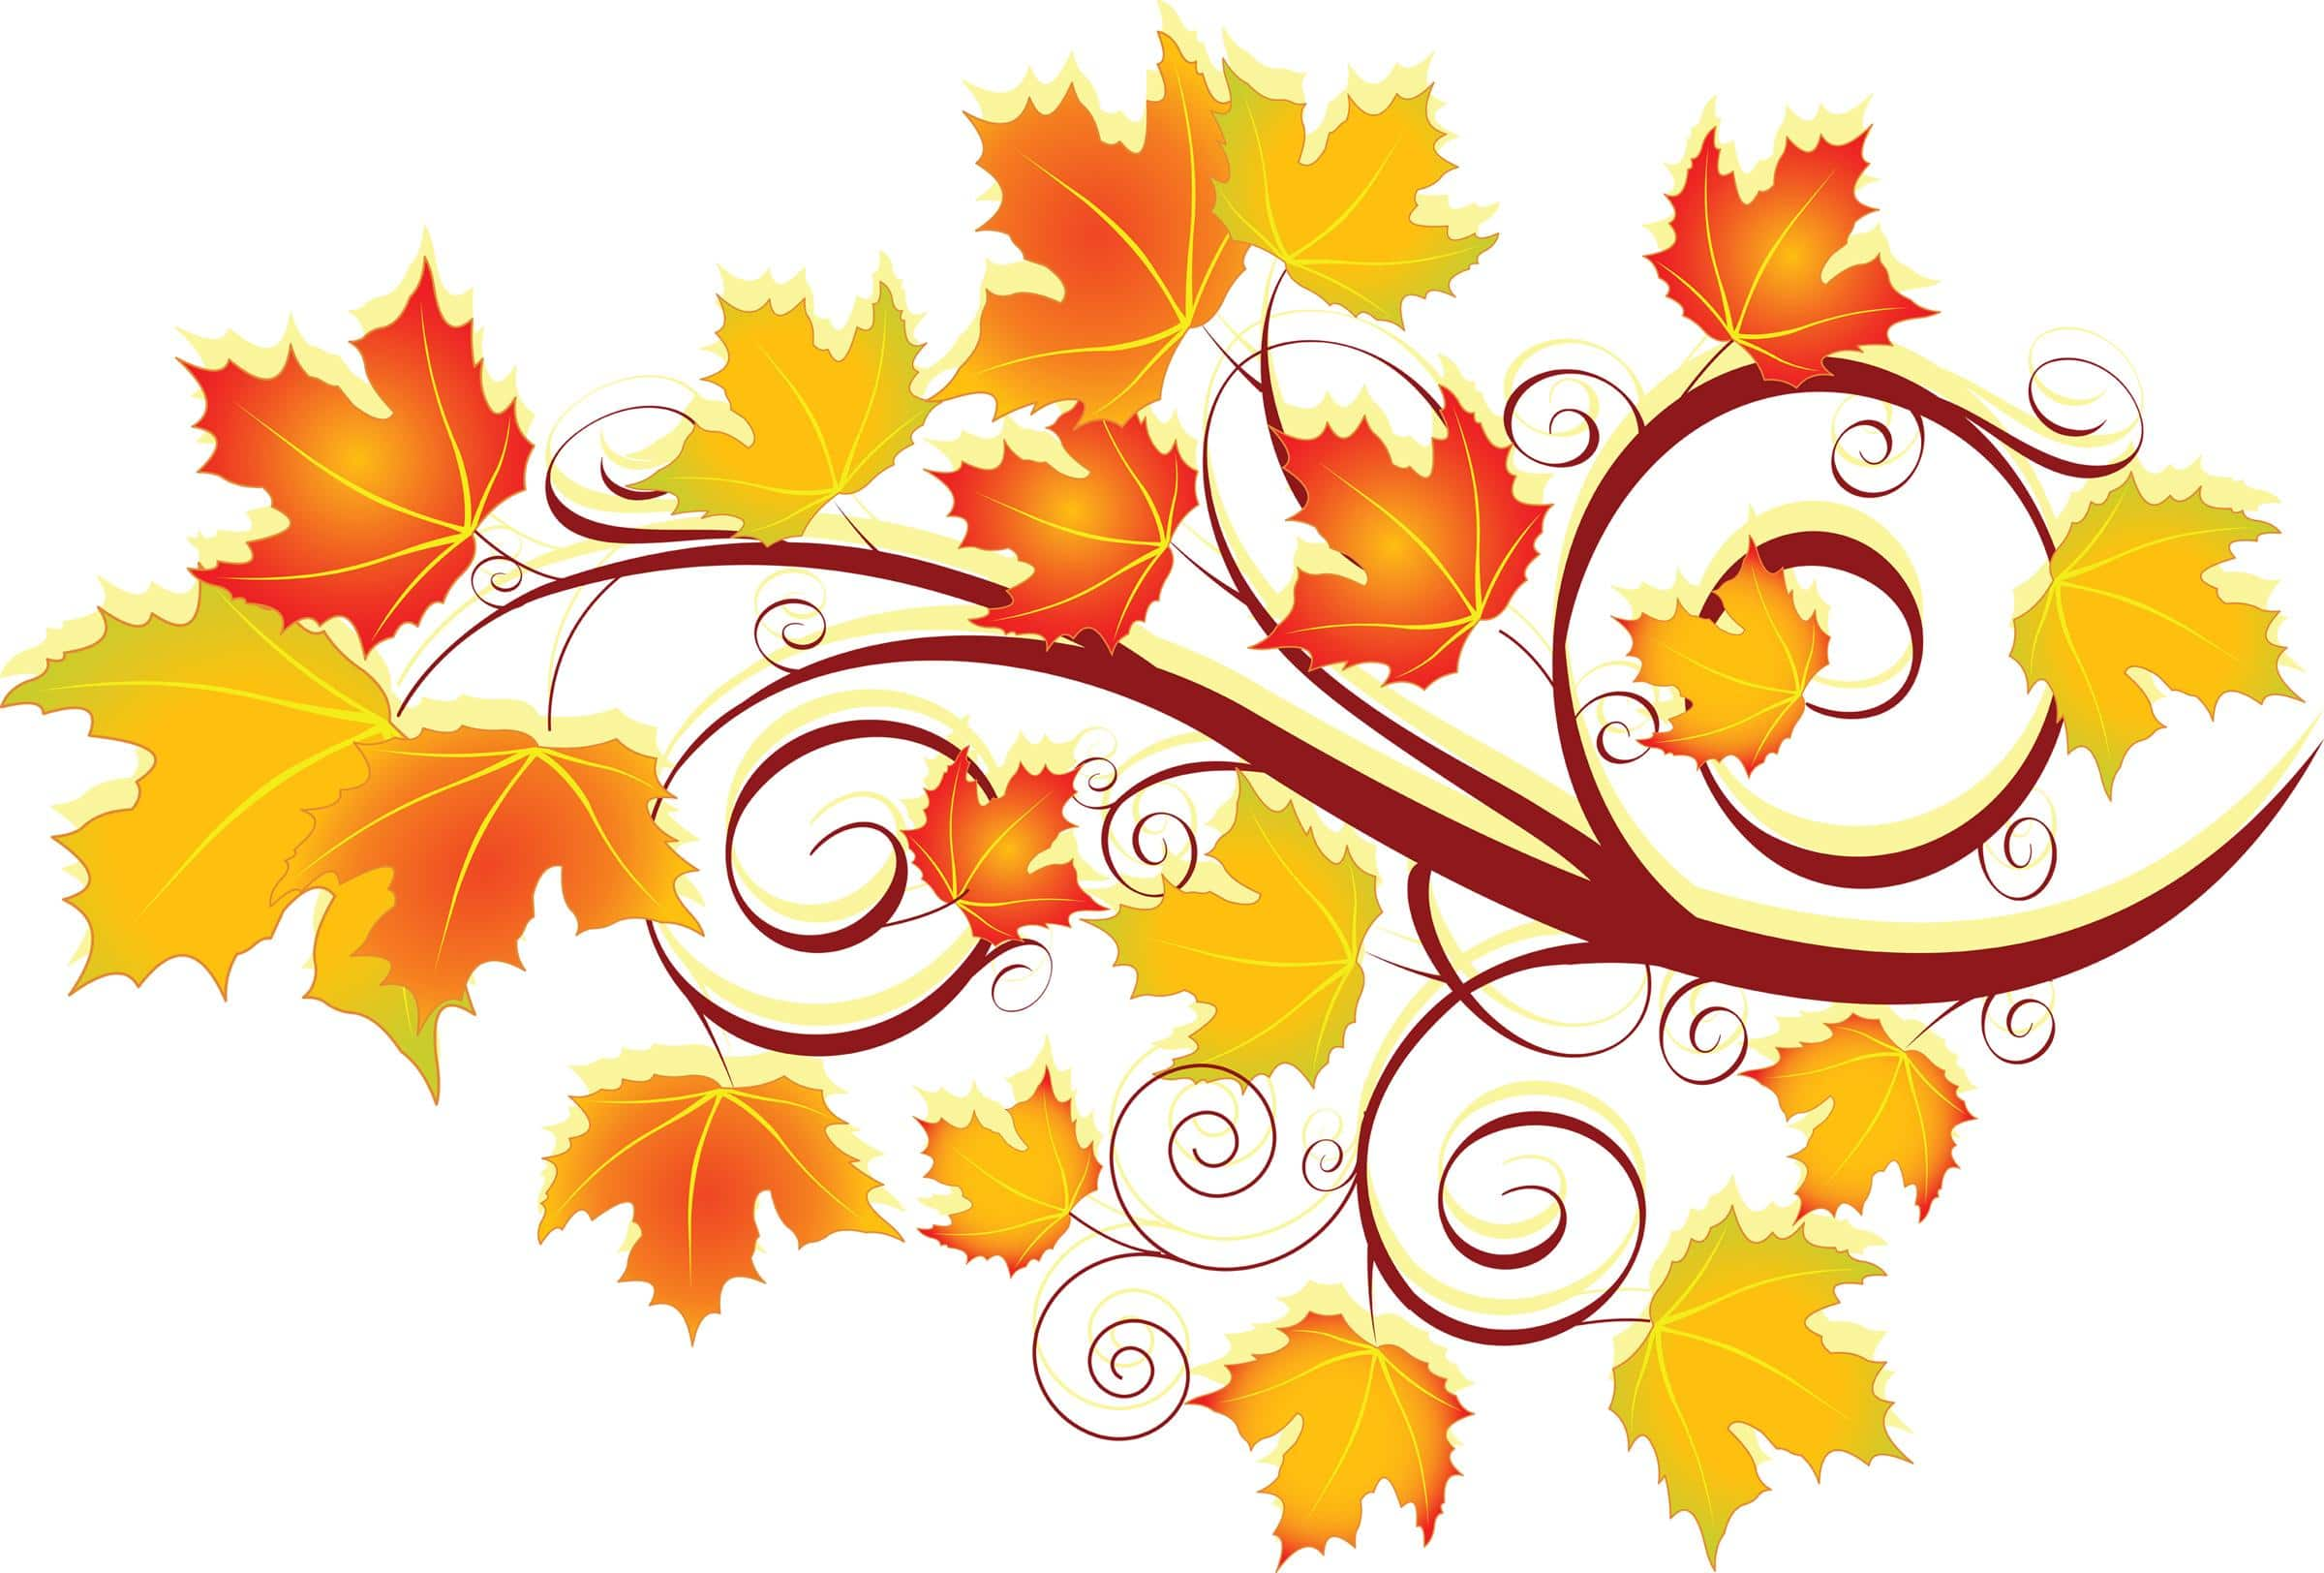 Fall Heart Leaves Background Wallpaper Fall Leaves